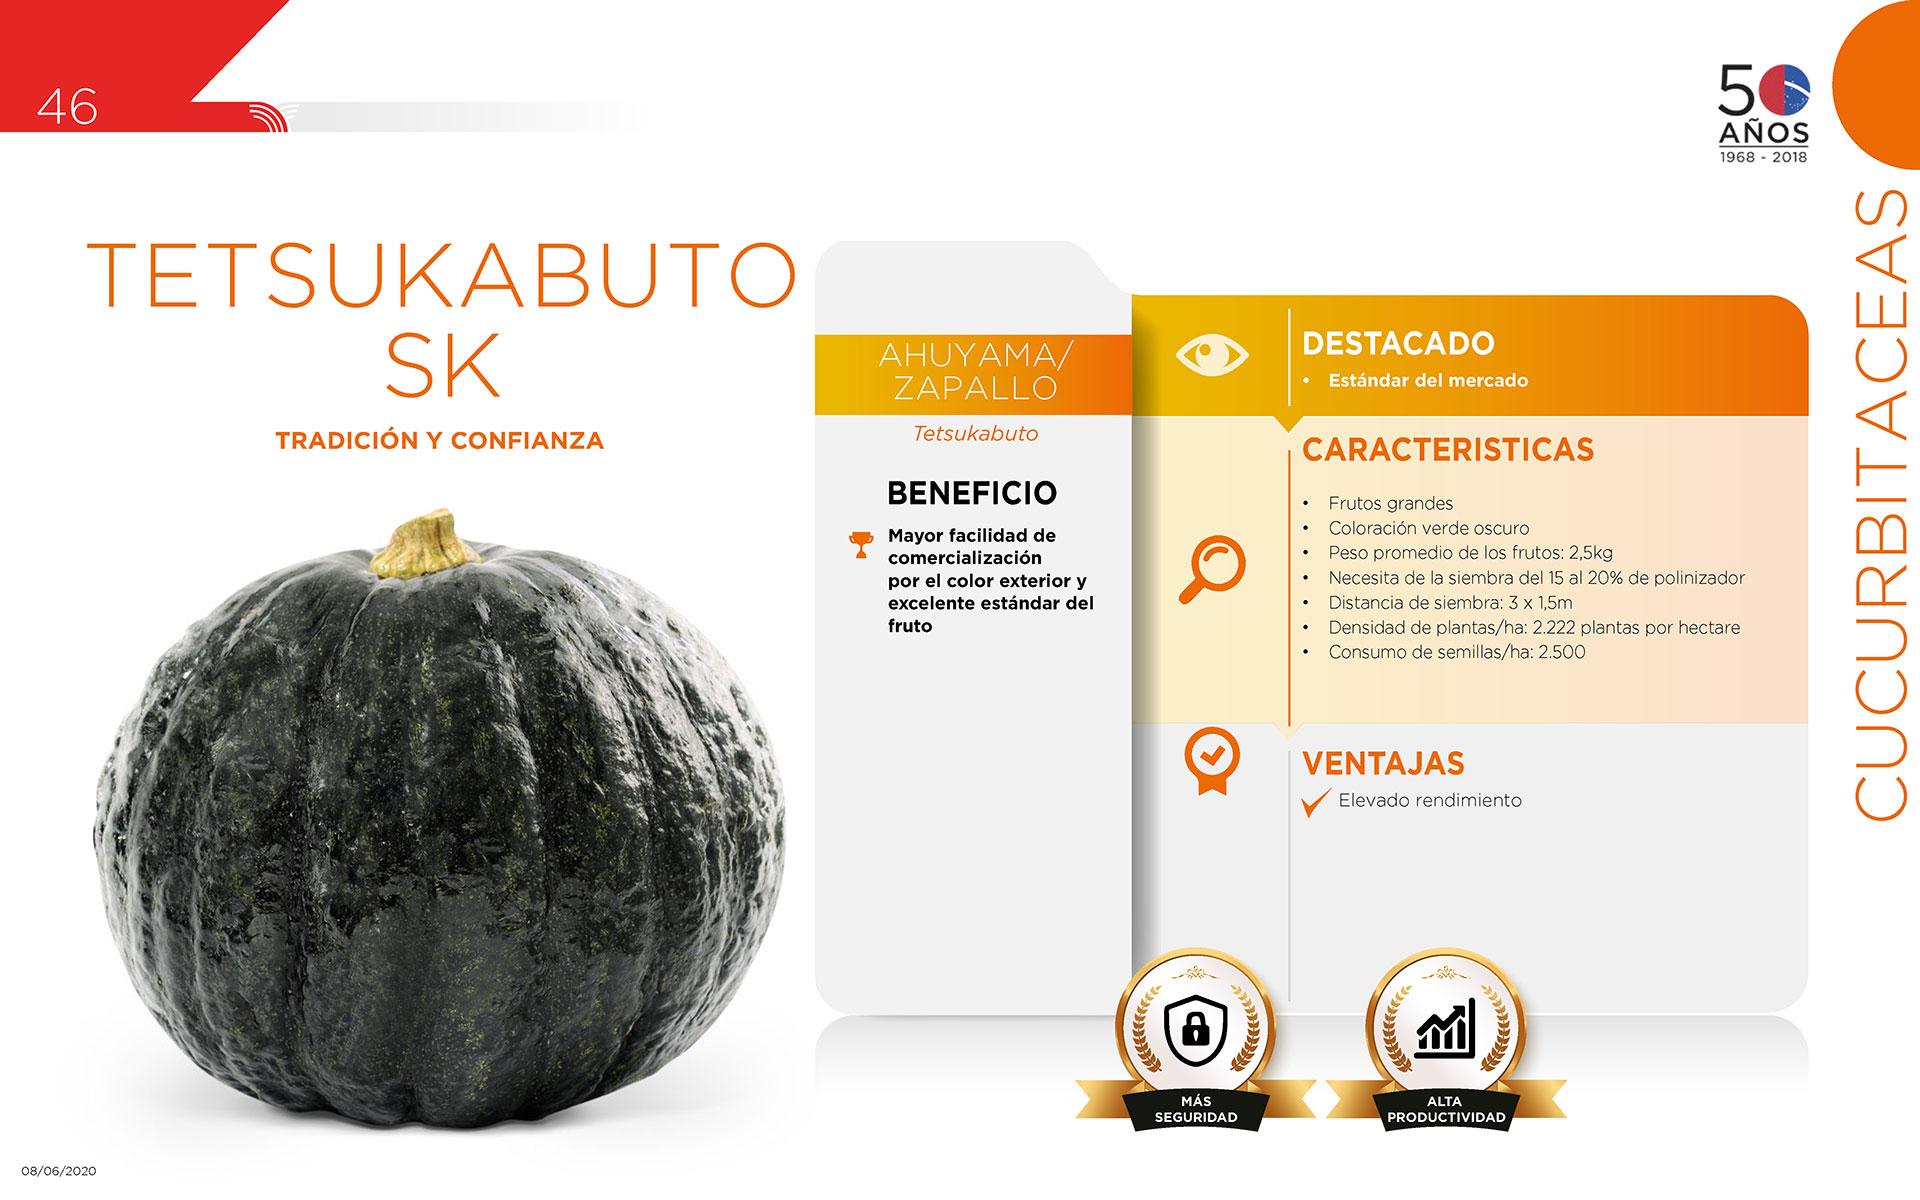 Tetsukabuto  SK - Cucurbitaceas